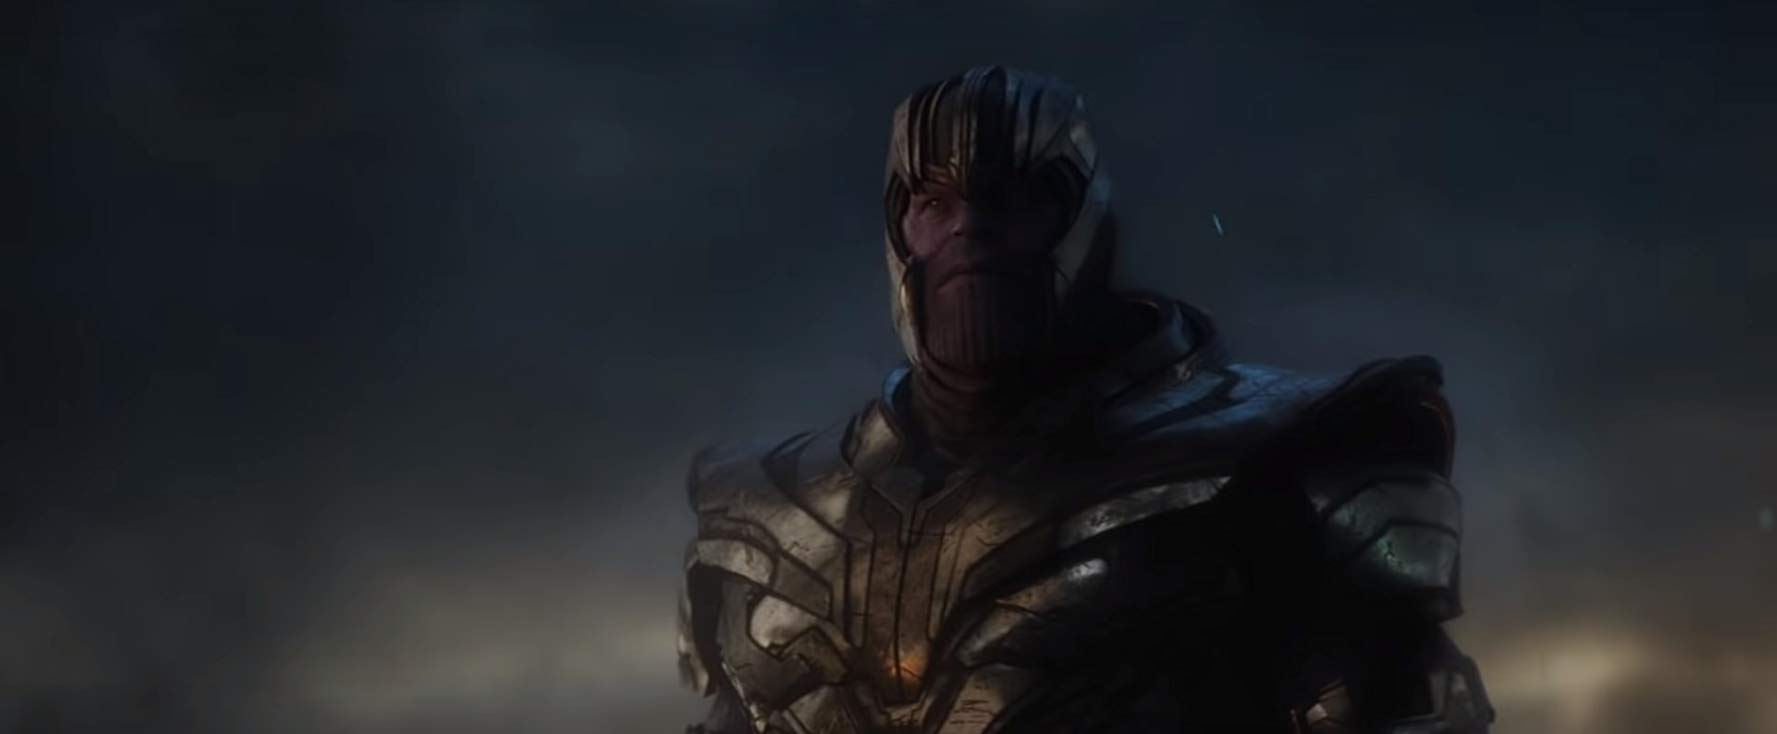 Avengers: Endgame, una scena con Thanos, alias Josh Brolin